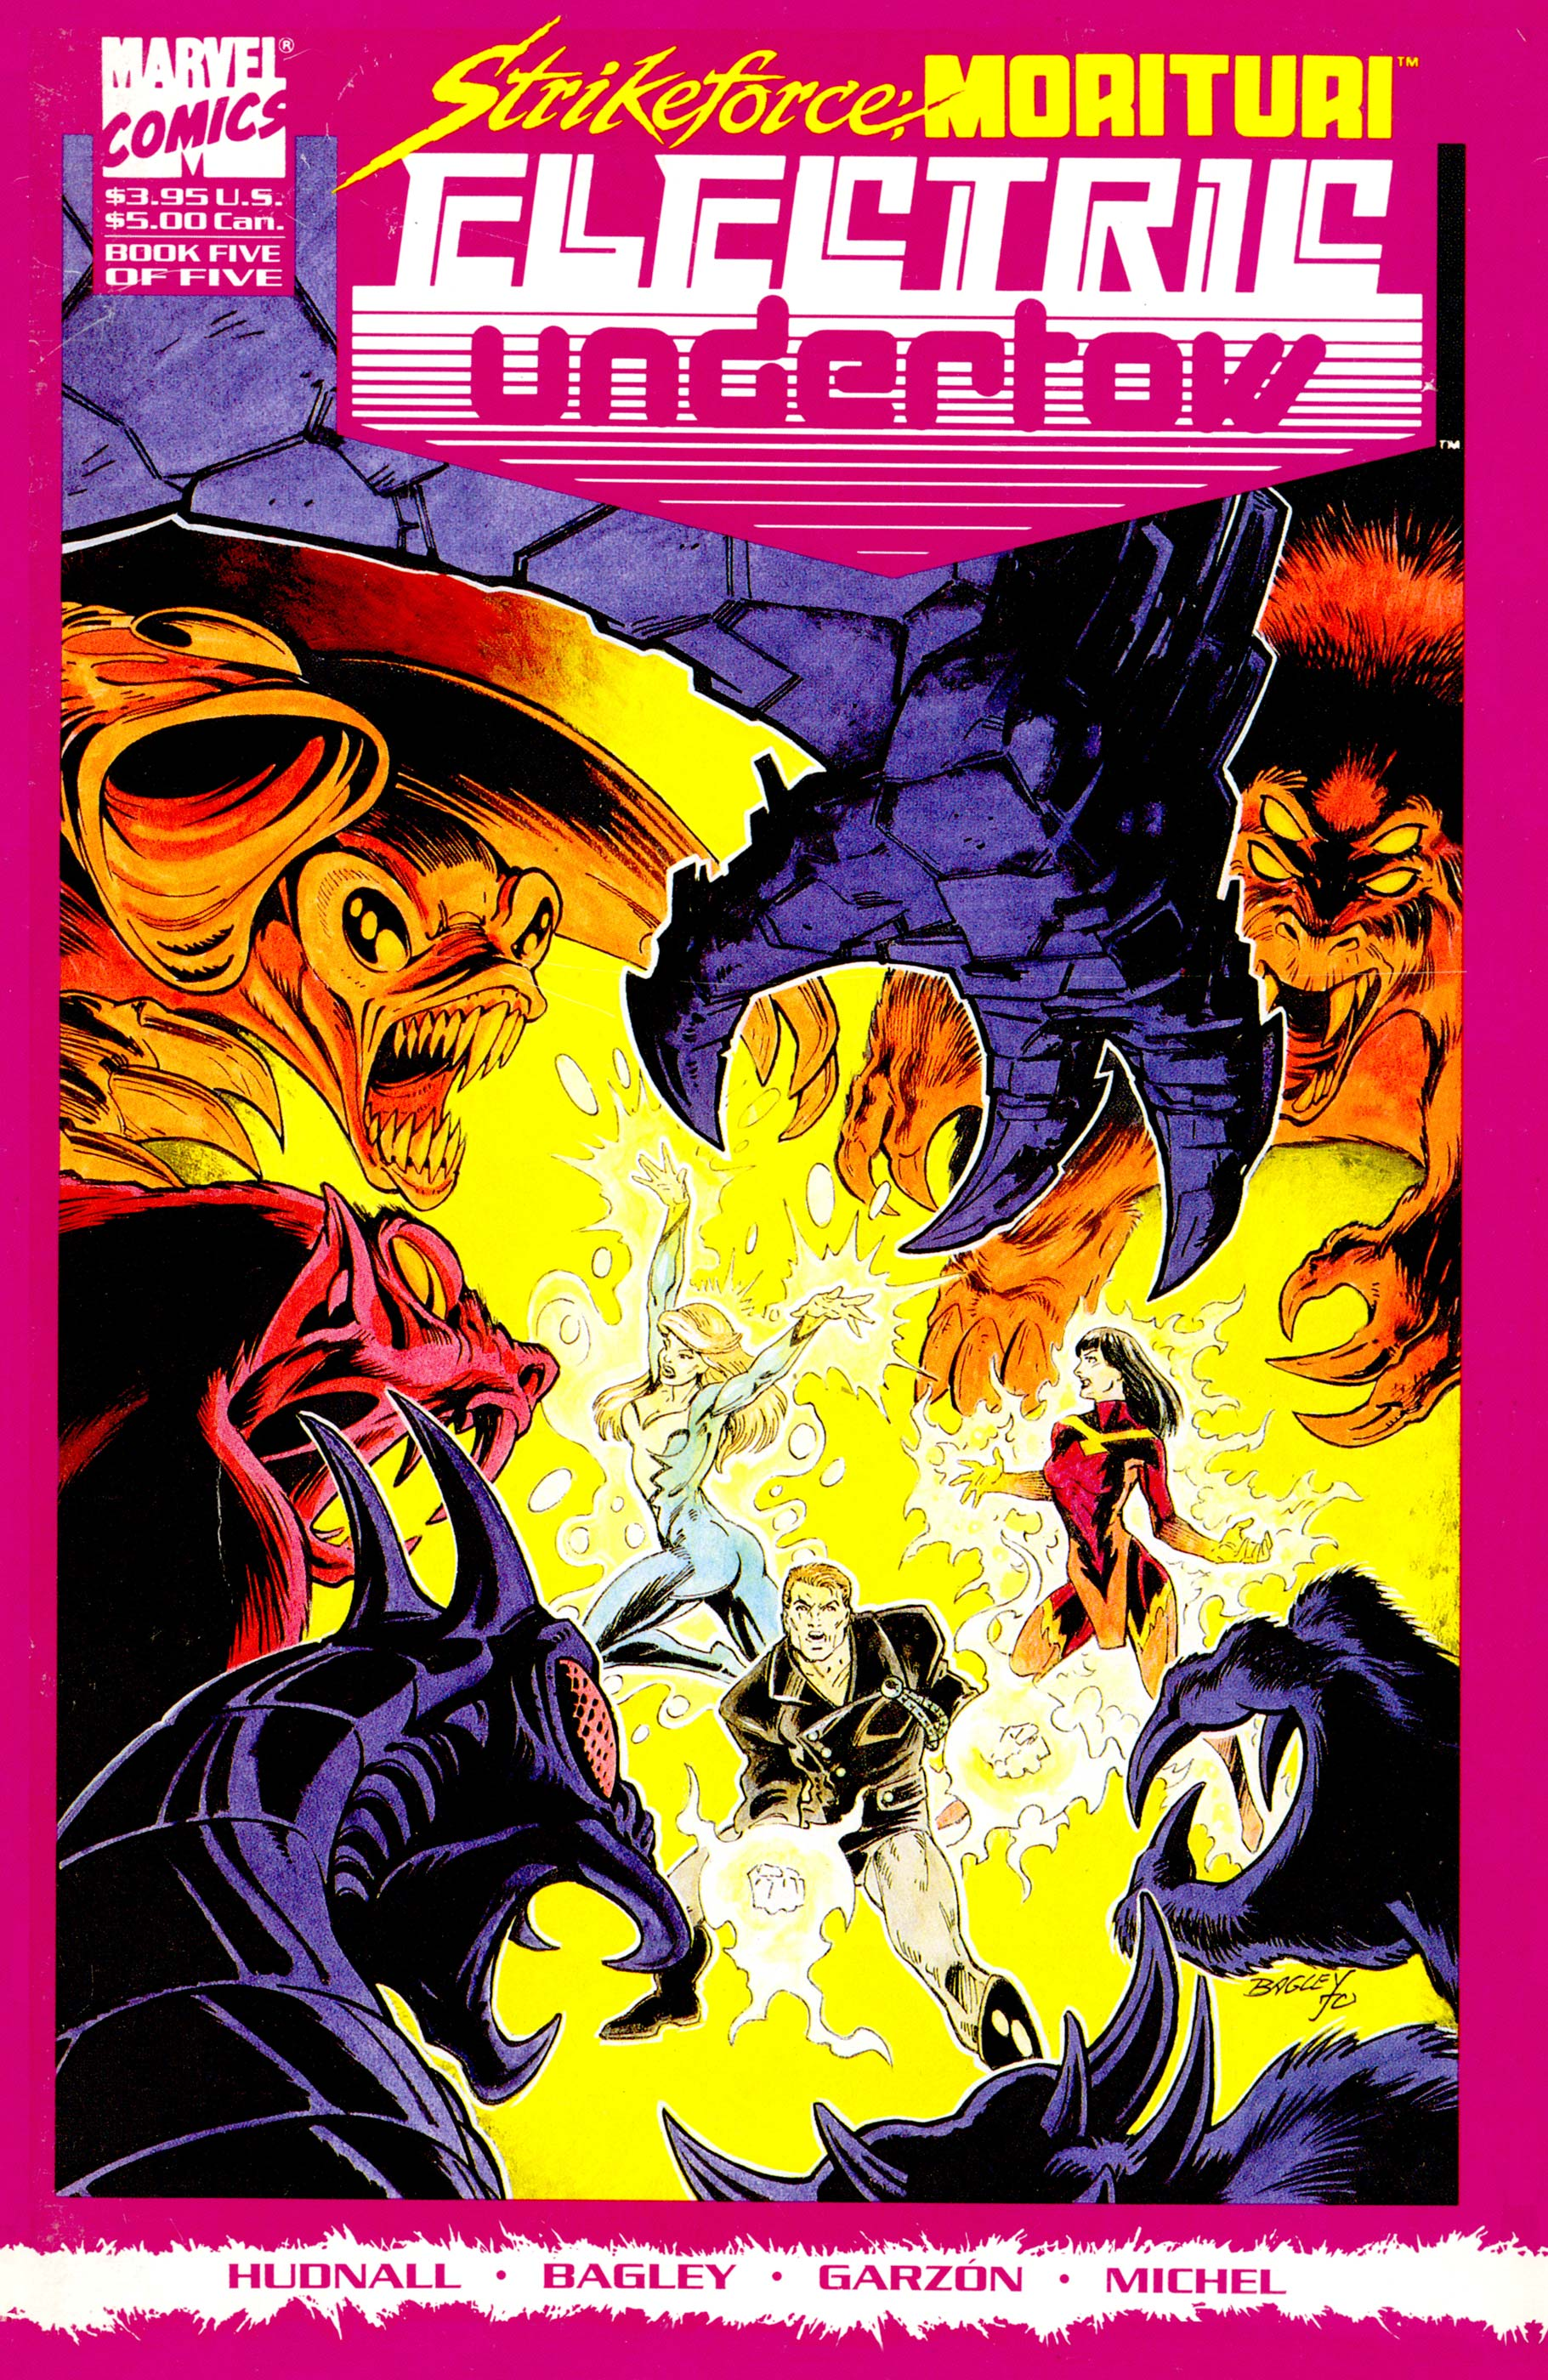 Strikeforce Morituri: Electric Undertow (1989) #5